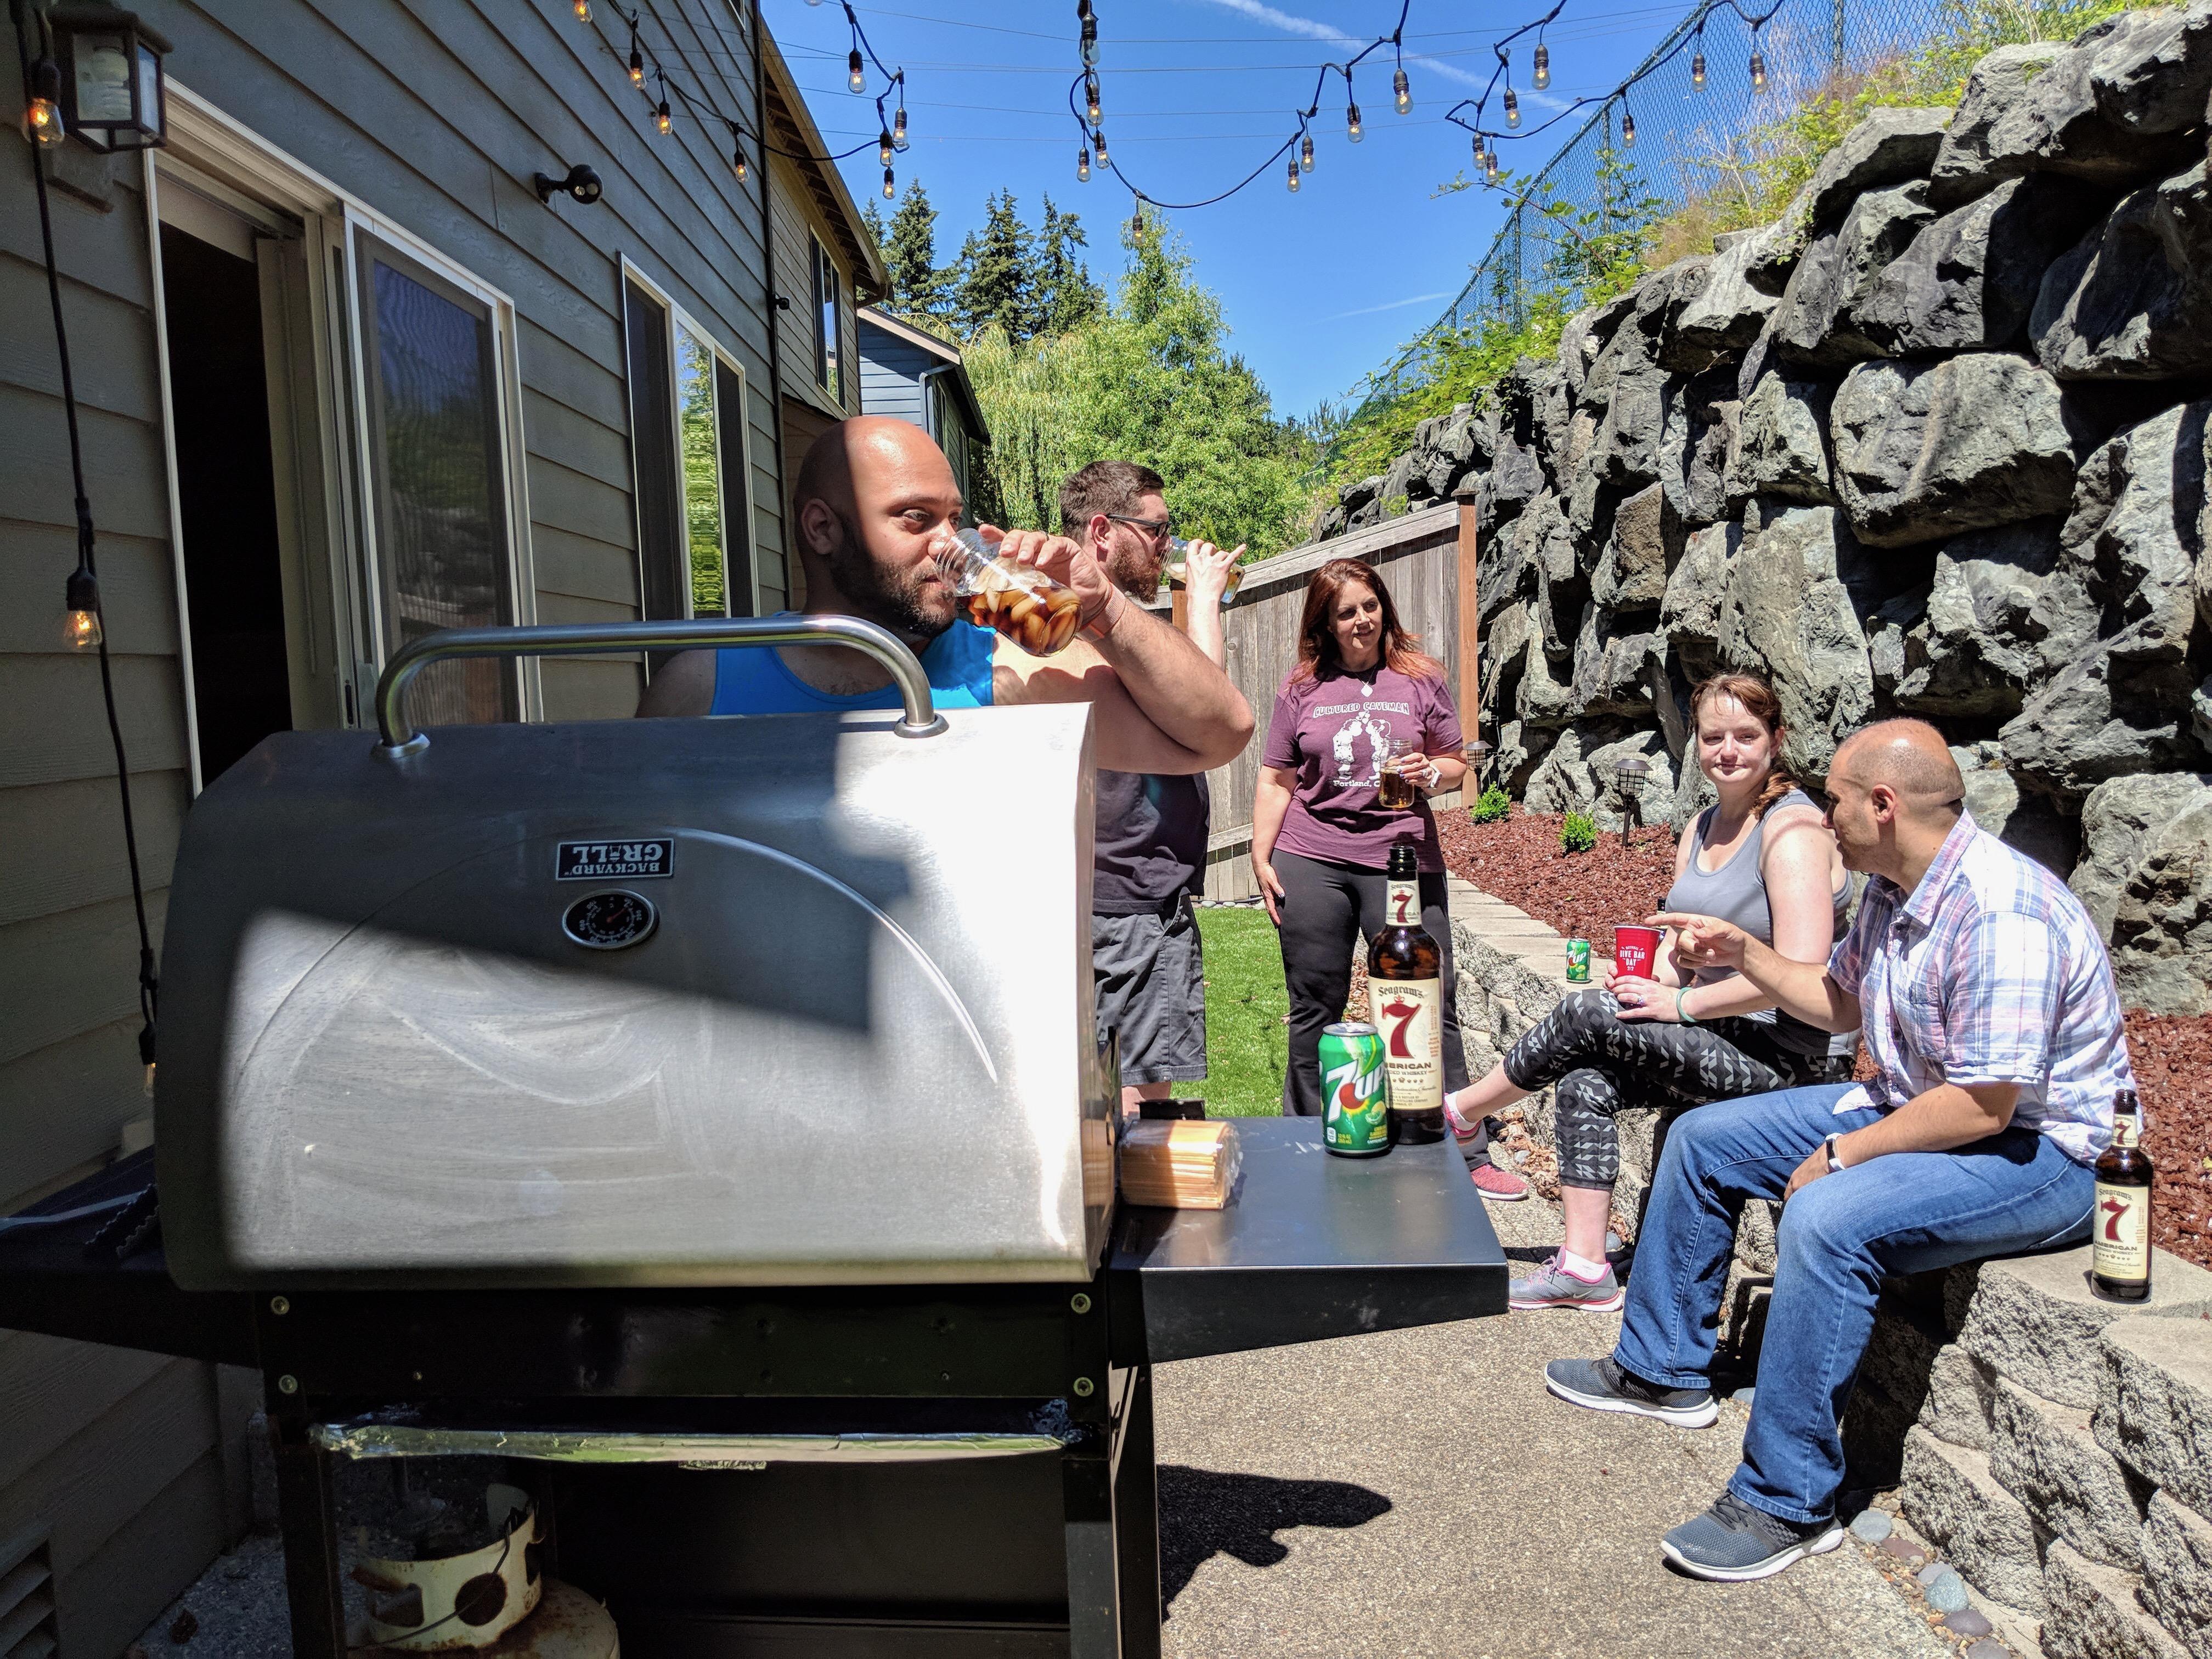 Home is the Key Habitat for Humanity backyard